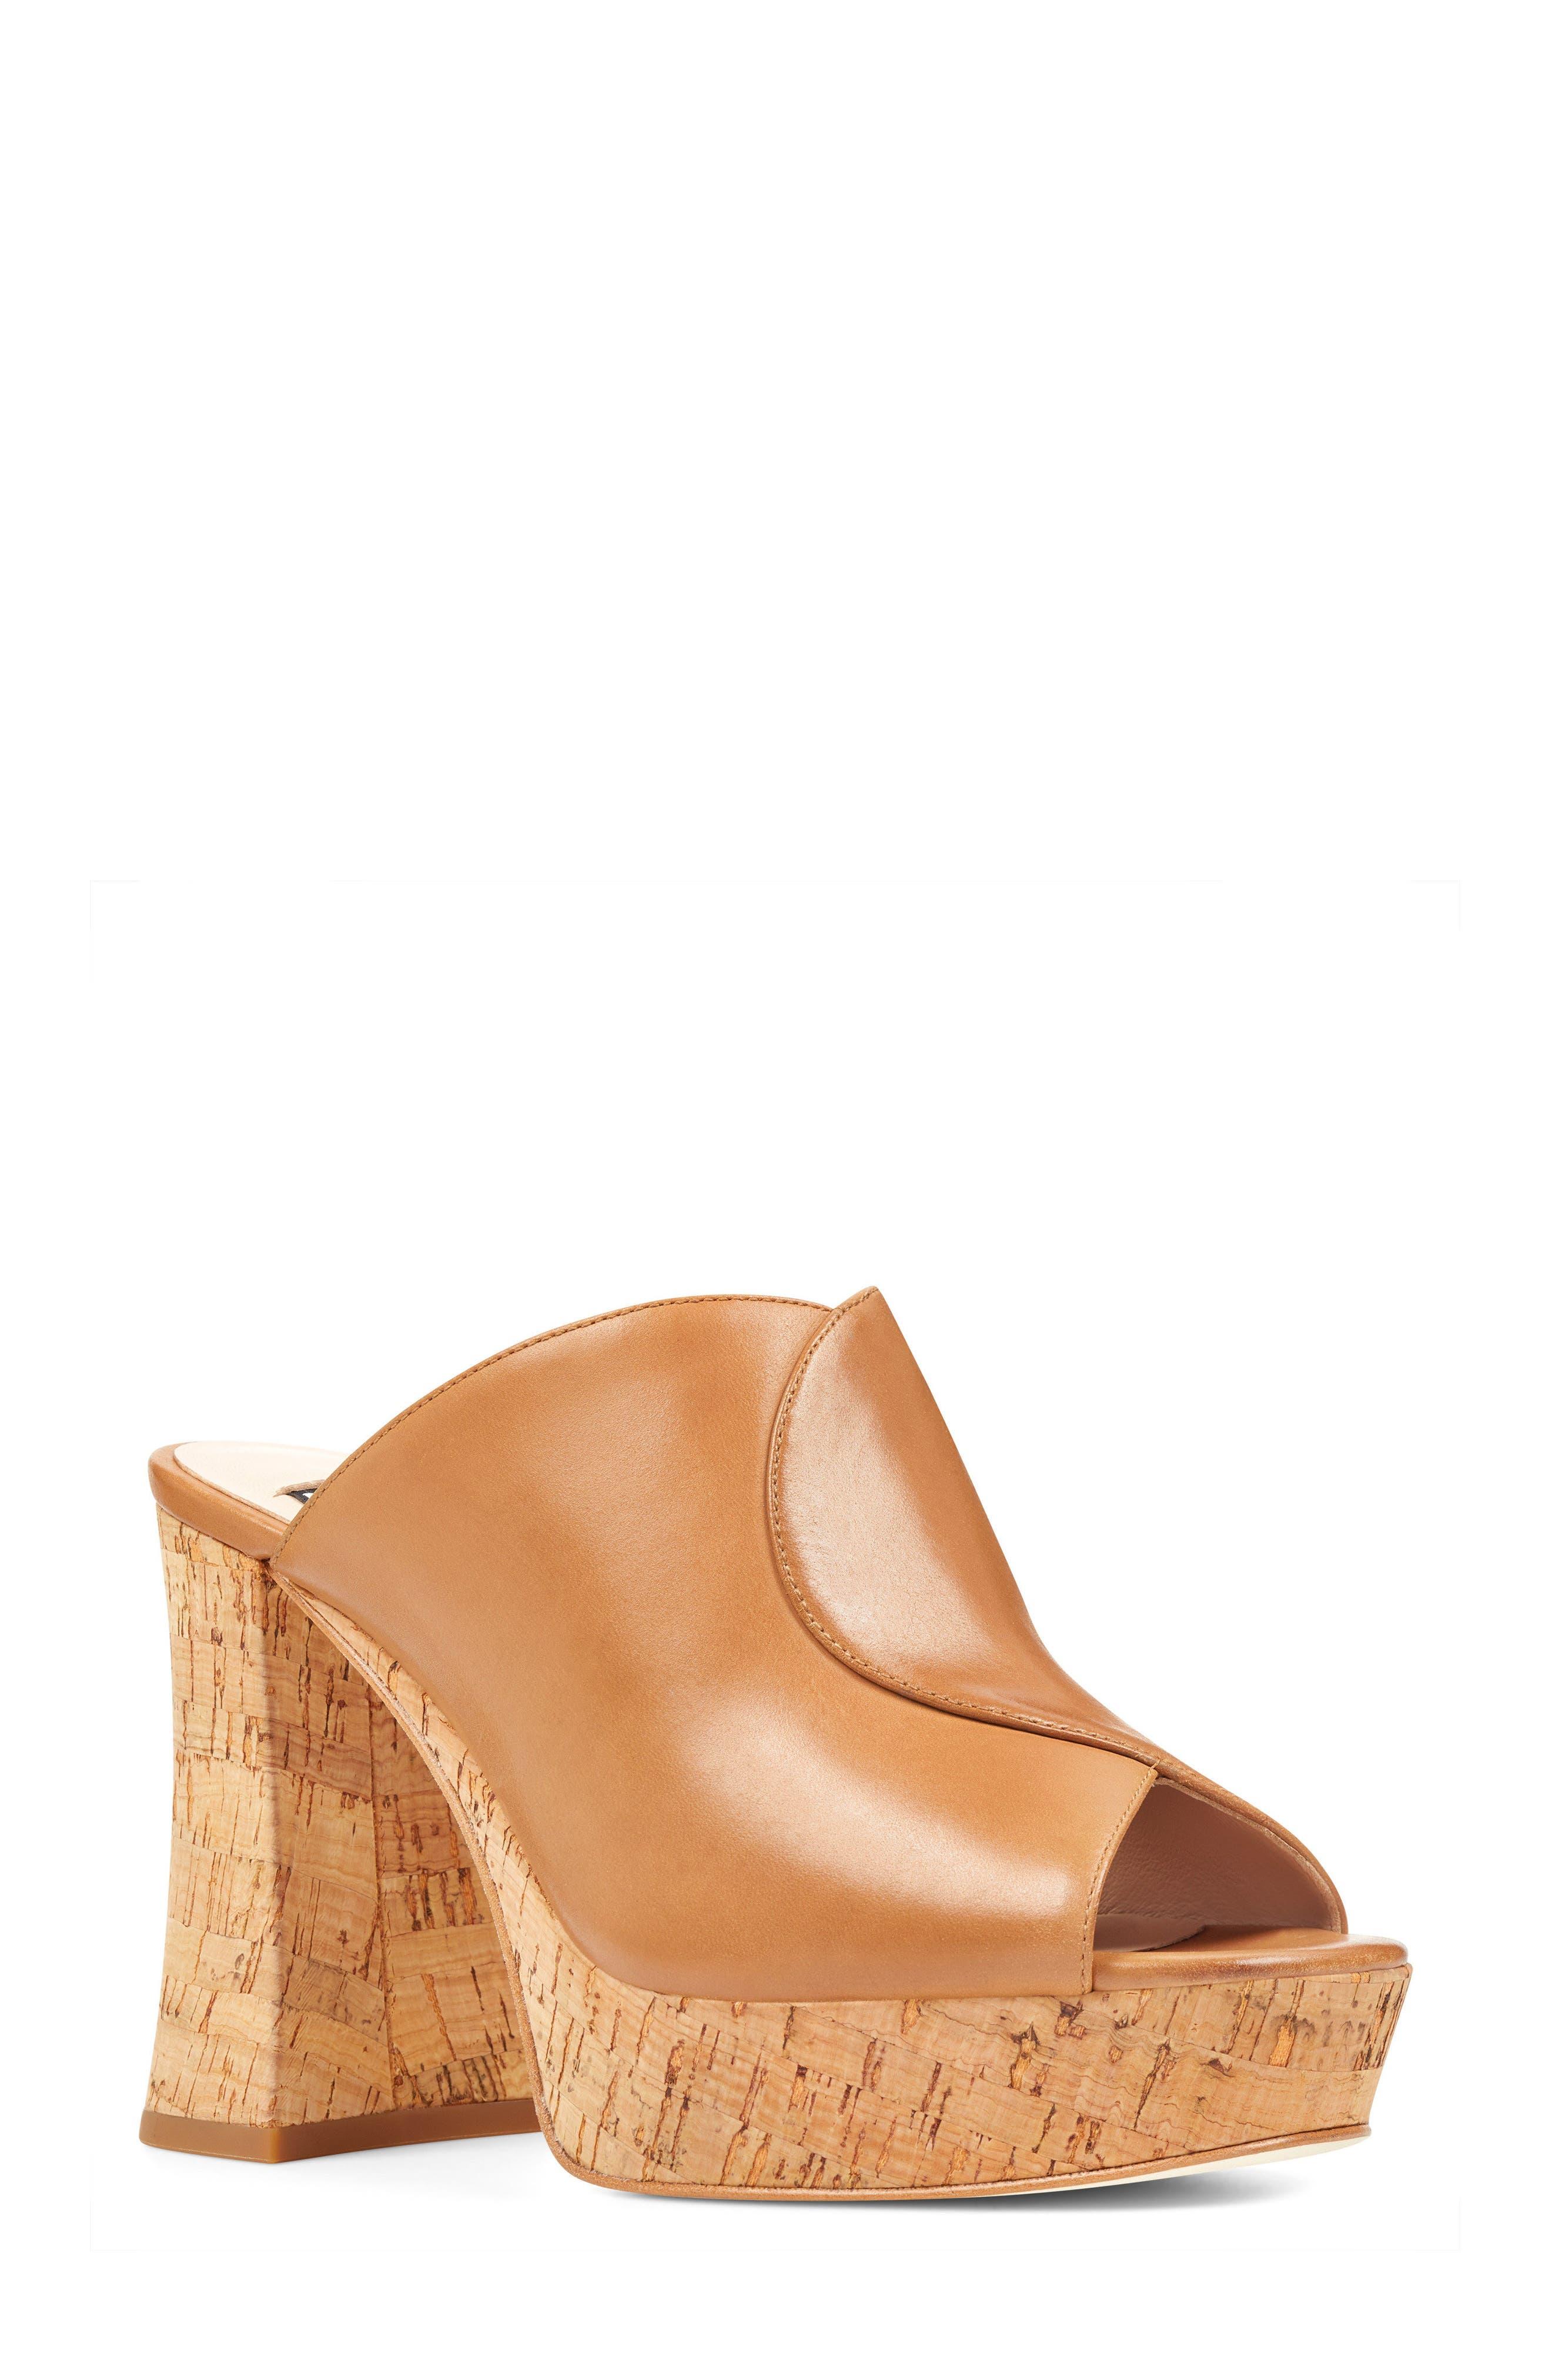 Lisana - 40th Anniversary Capsule Collection Platform Slide Sandal,                             Main thumbnail 1, color,                             Dark Natural Leather